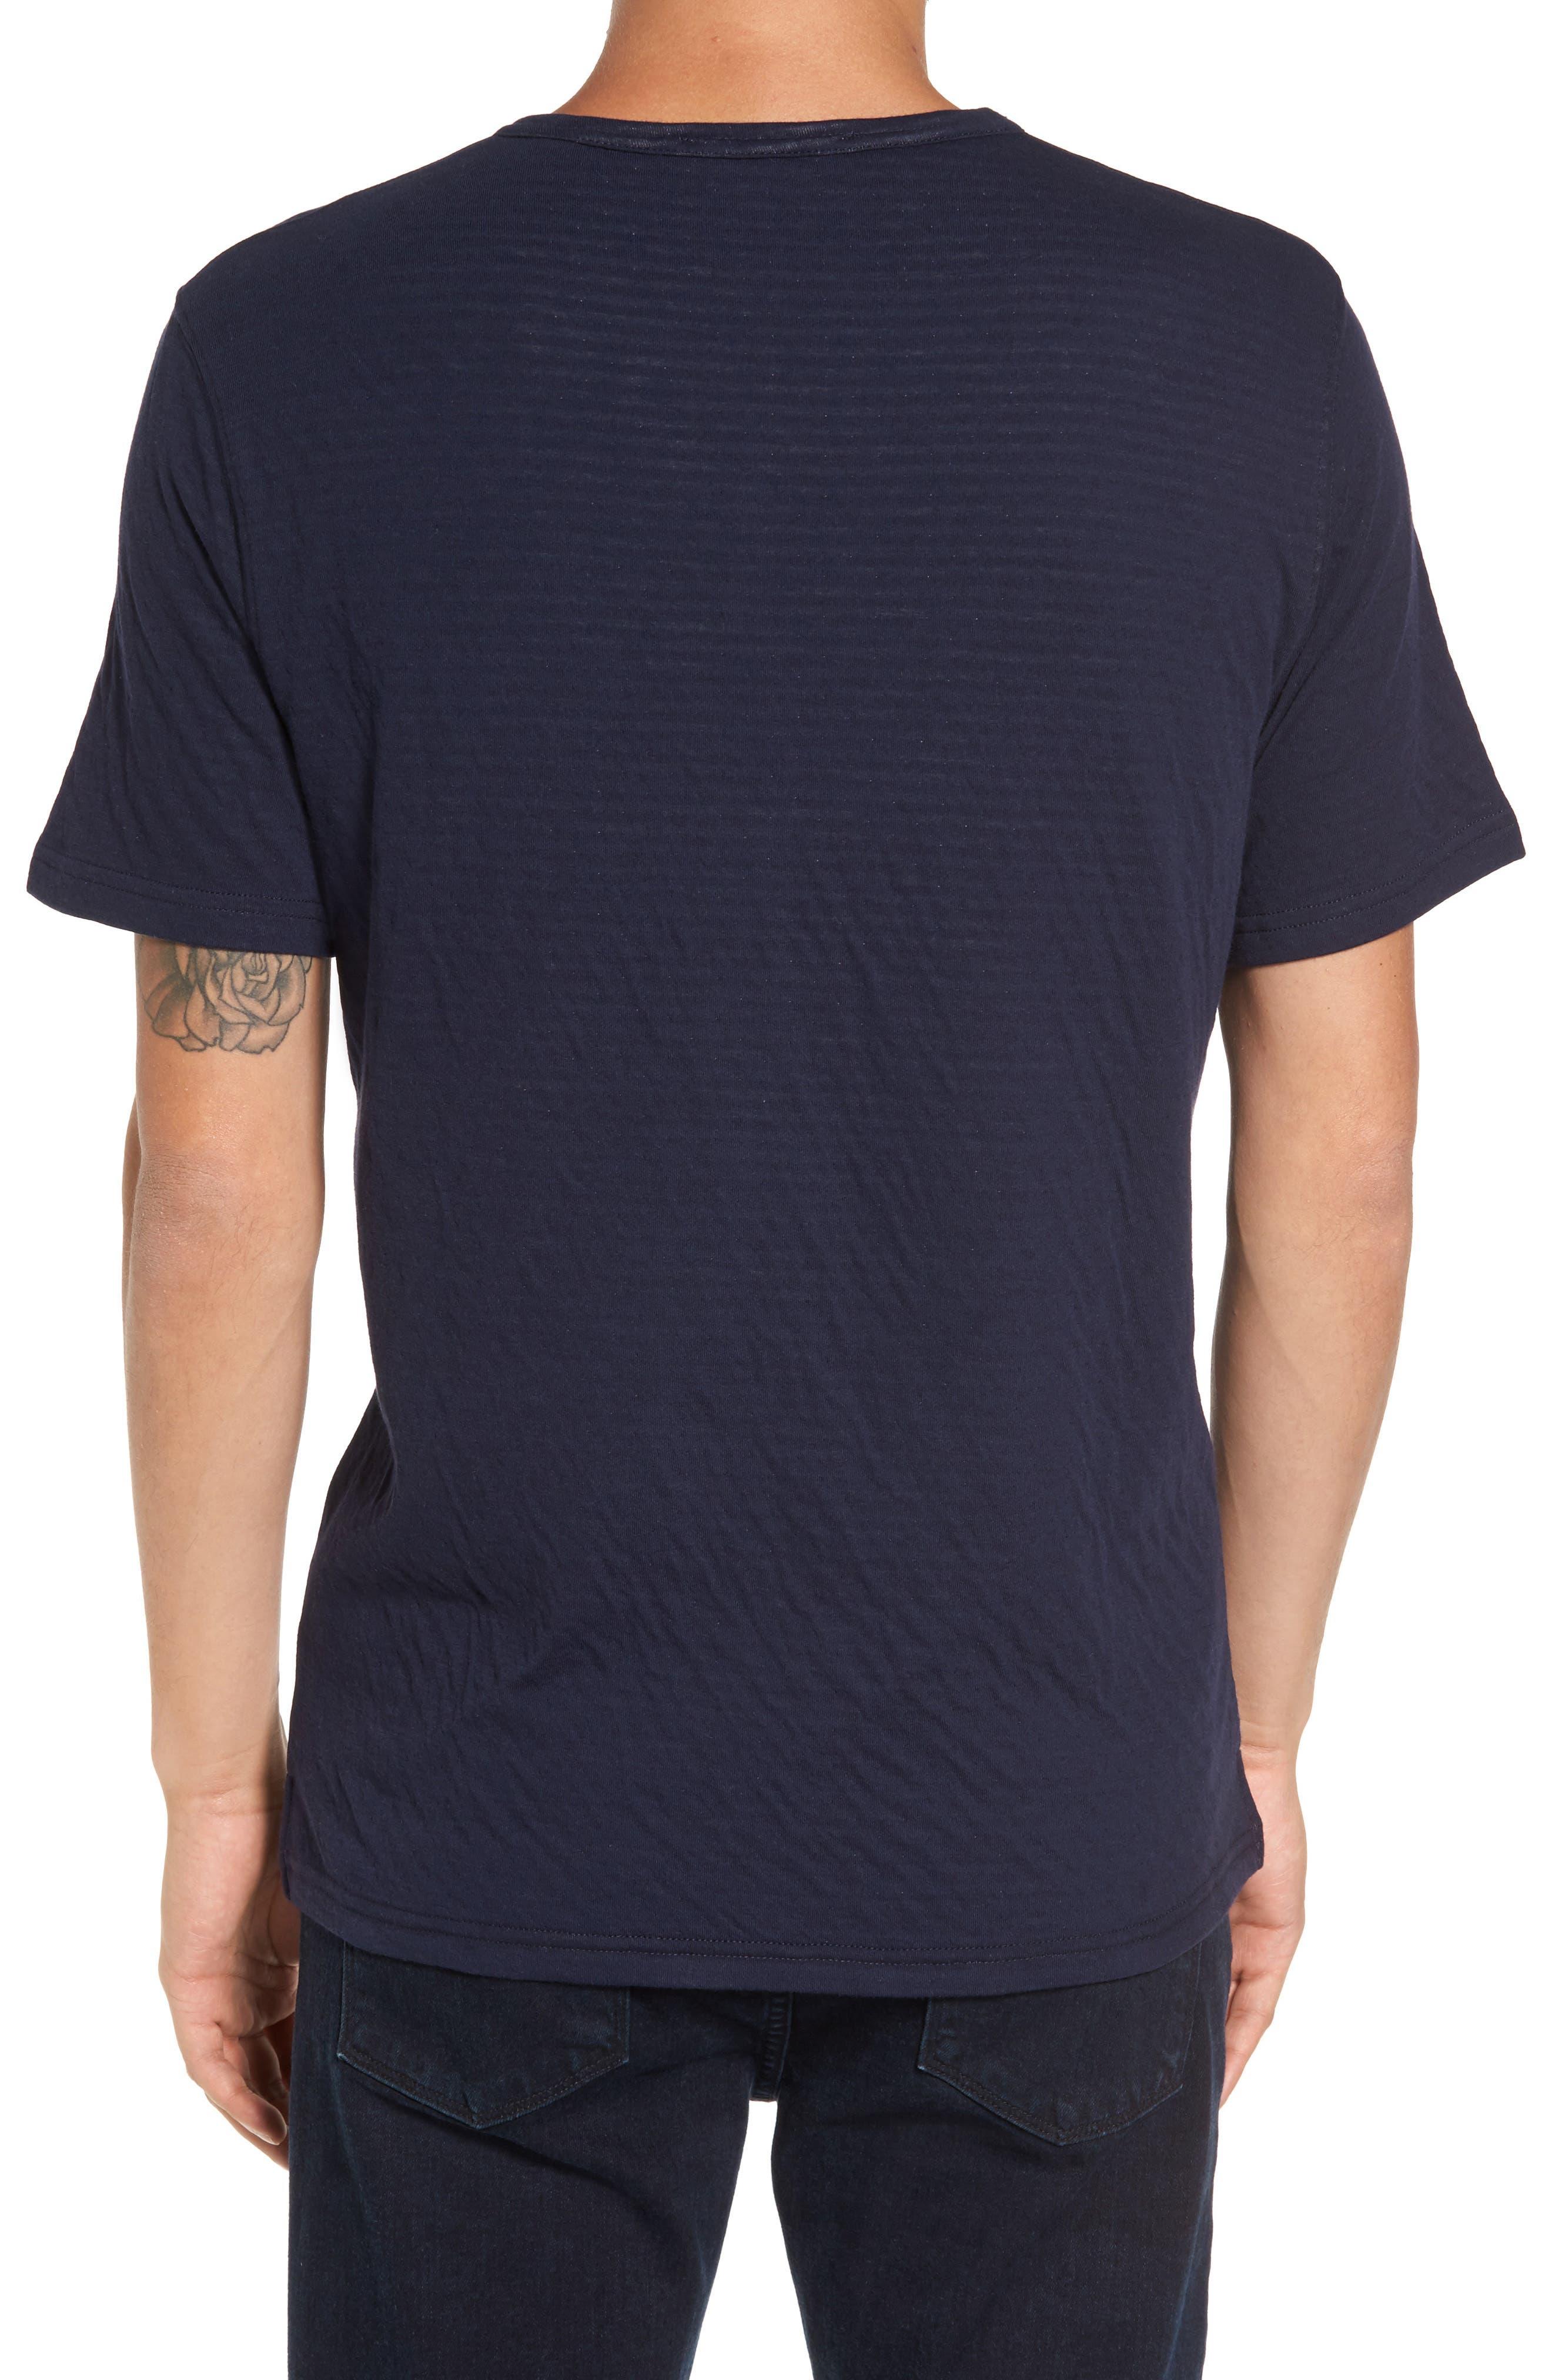 Alternate Image 2  - Slate & Stone Striped Pocket T-Shirt